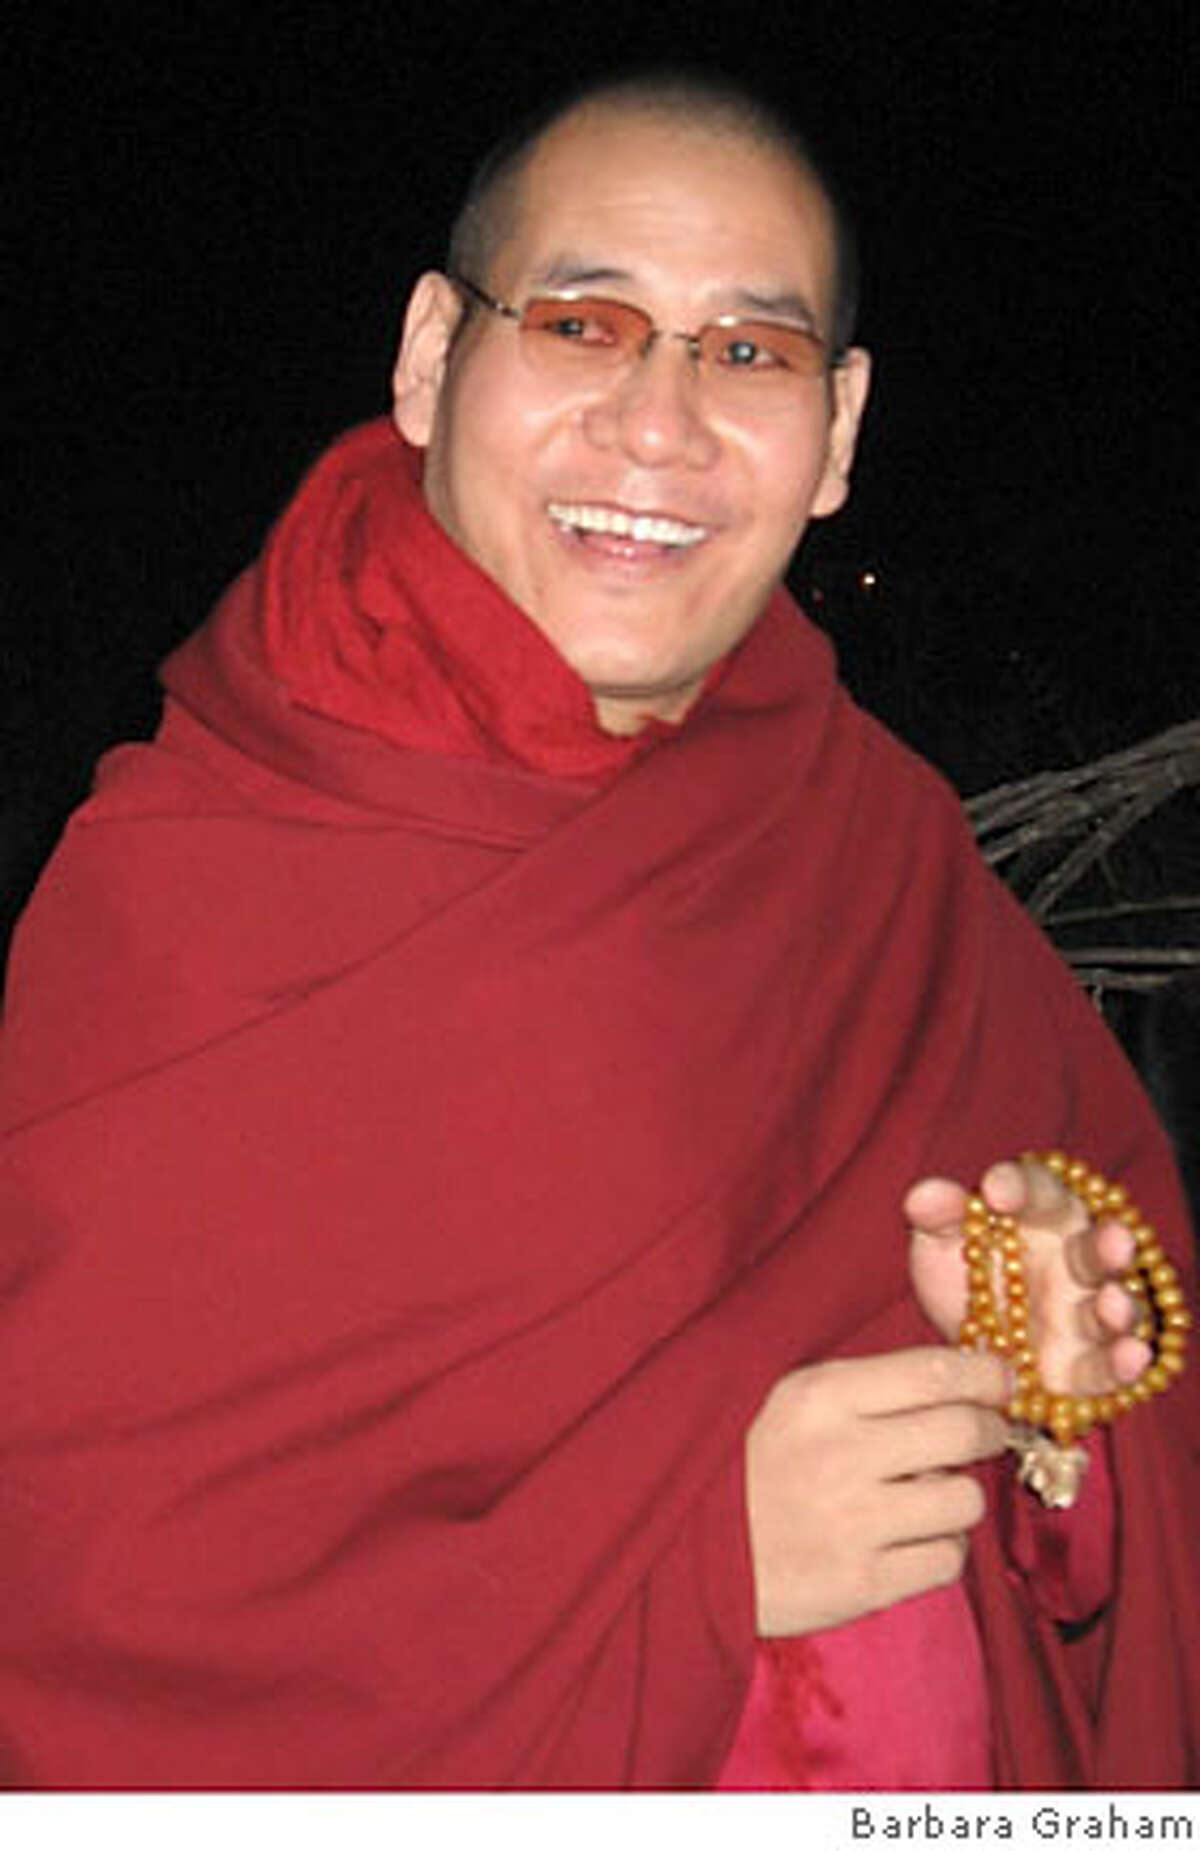 Phagyab Rinpoche. Photo by Barbara Graham